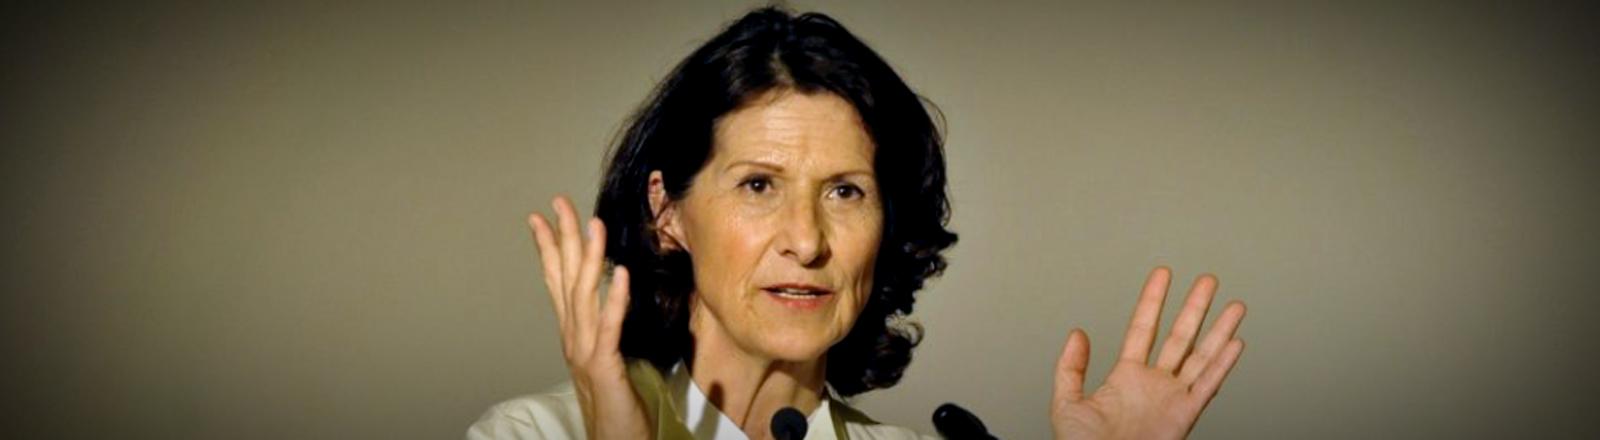 Die Reporterin Antonia Rados